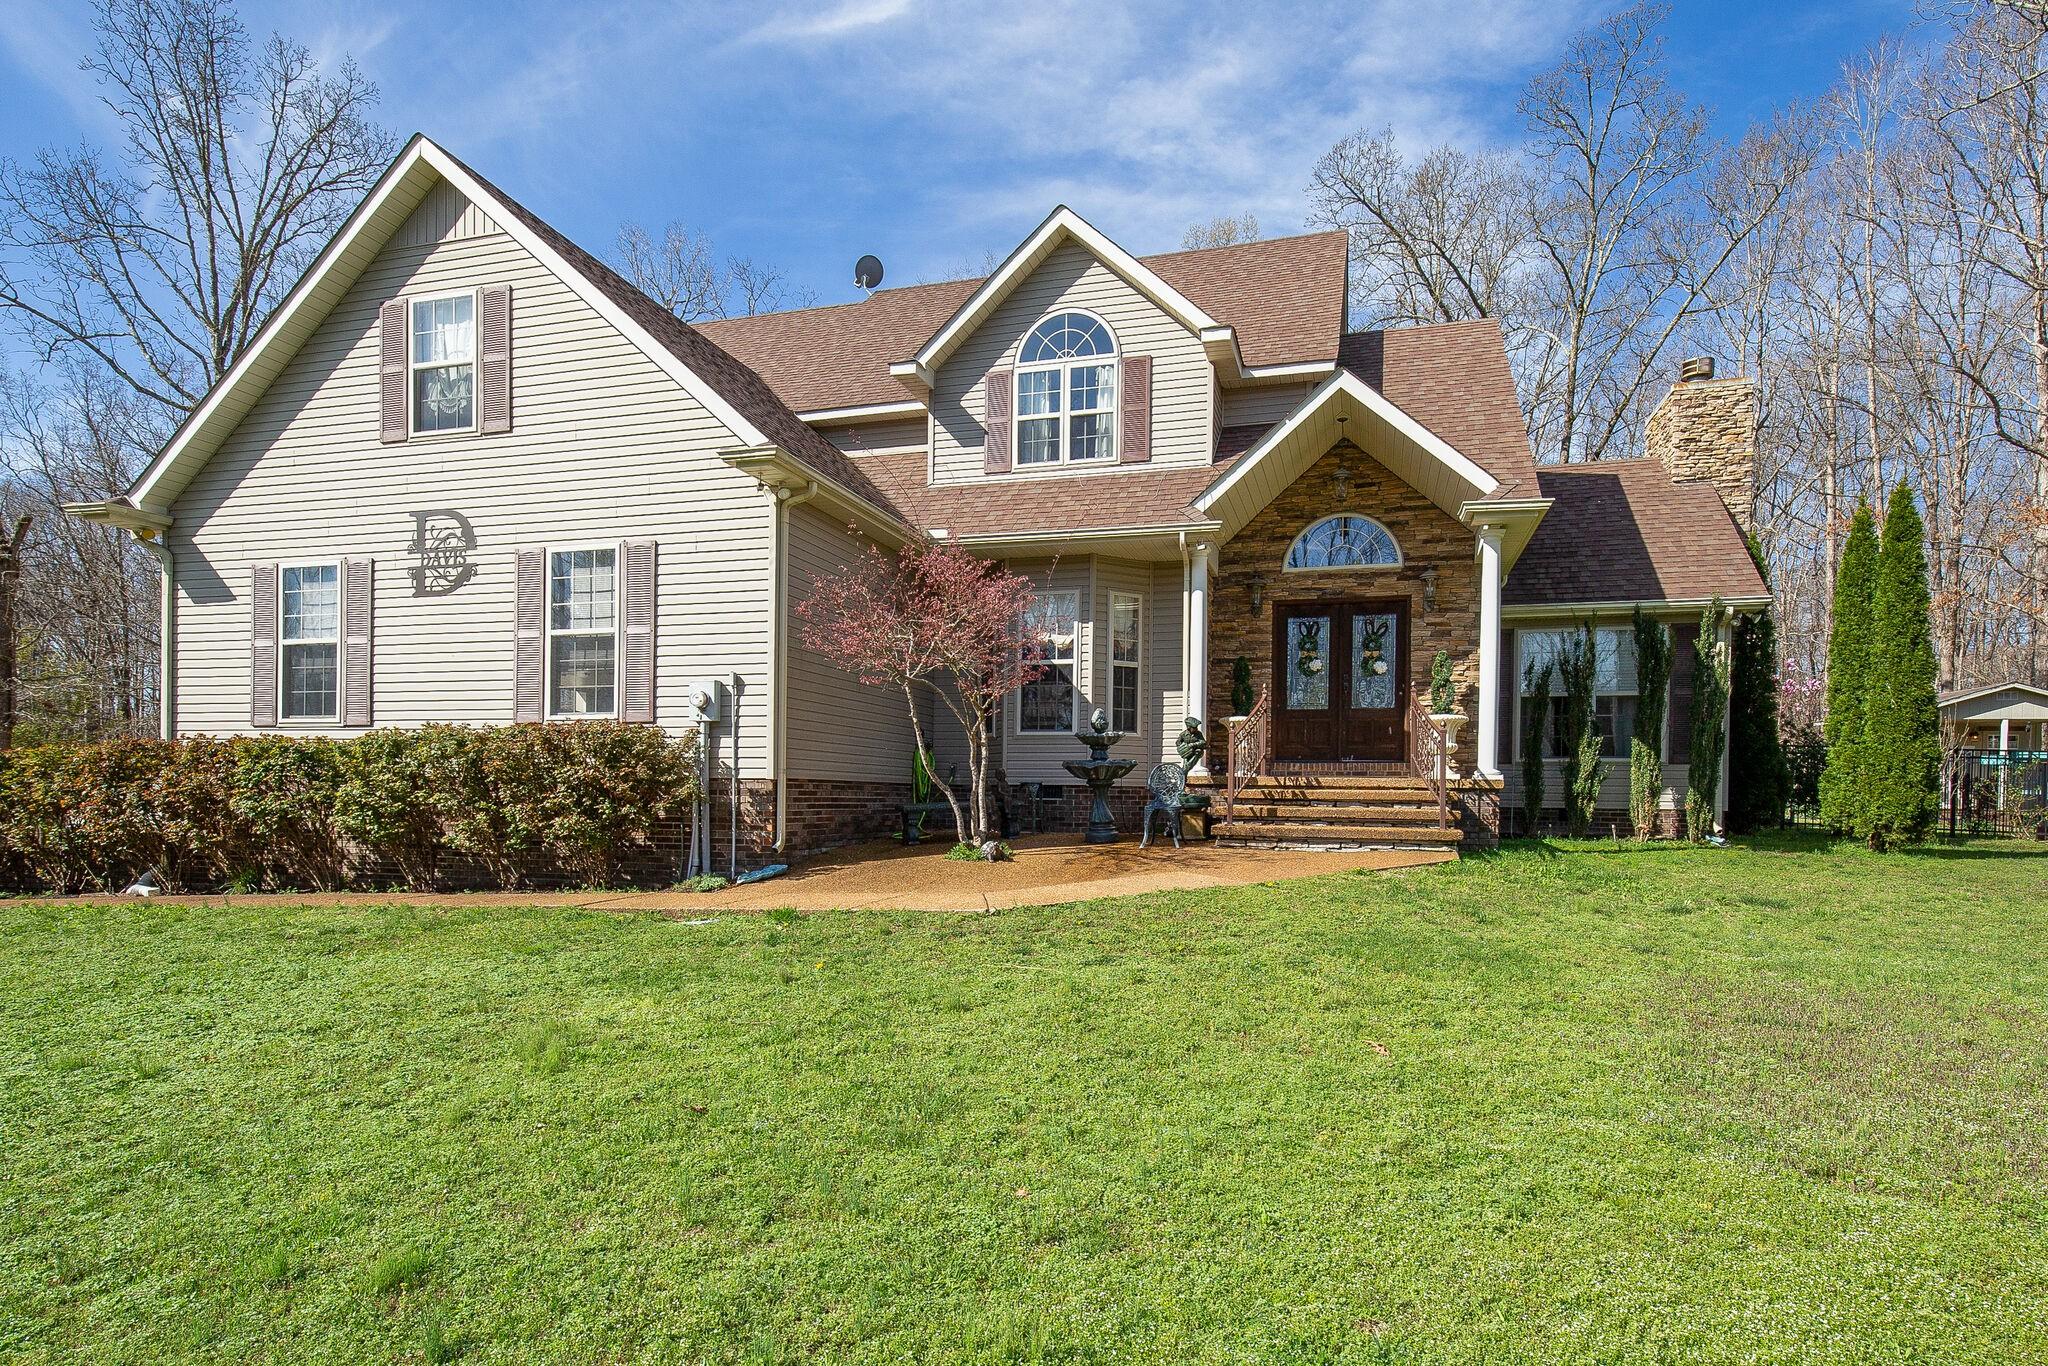 151 Windwood Ln Property Photo - Hohenwald, TN real estate listing